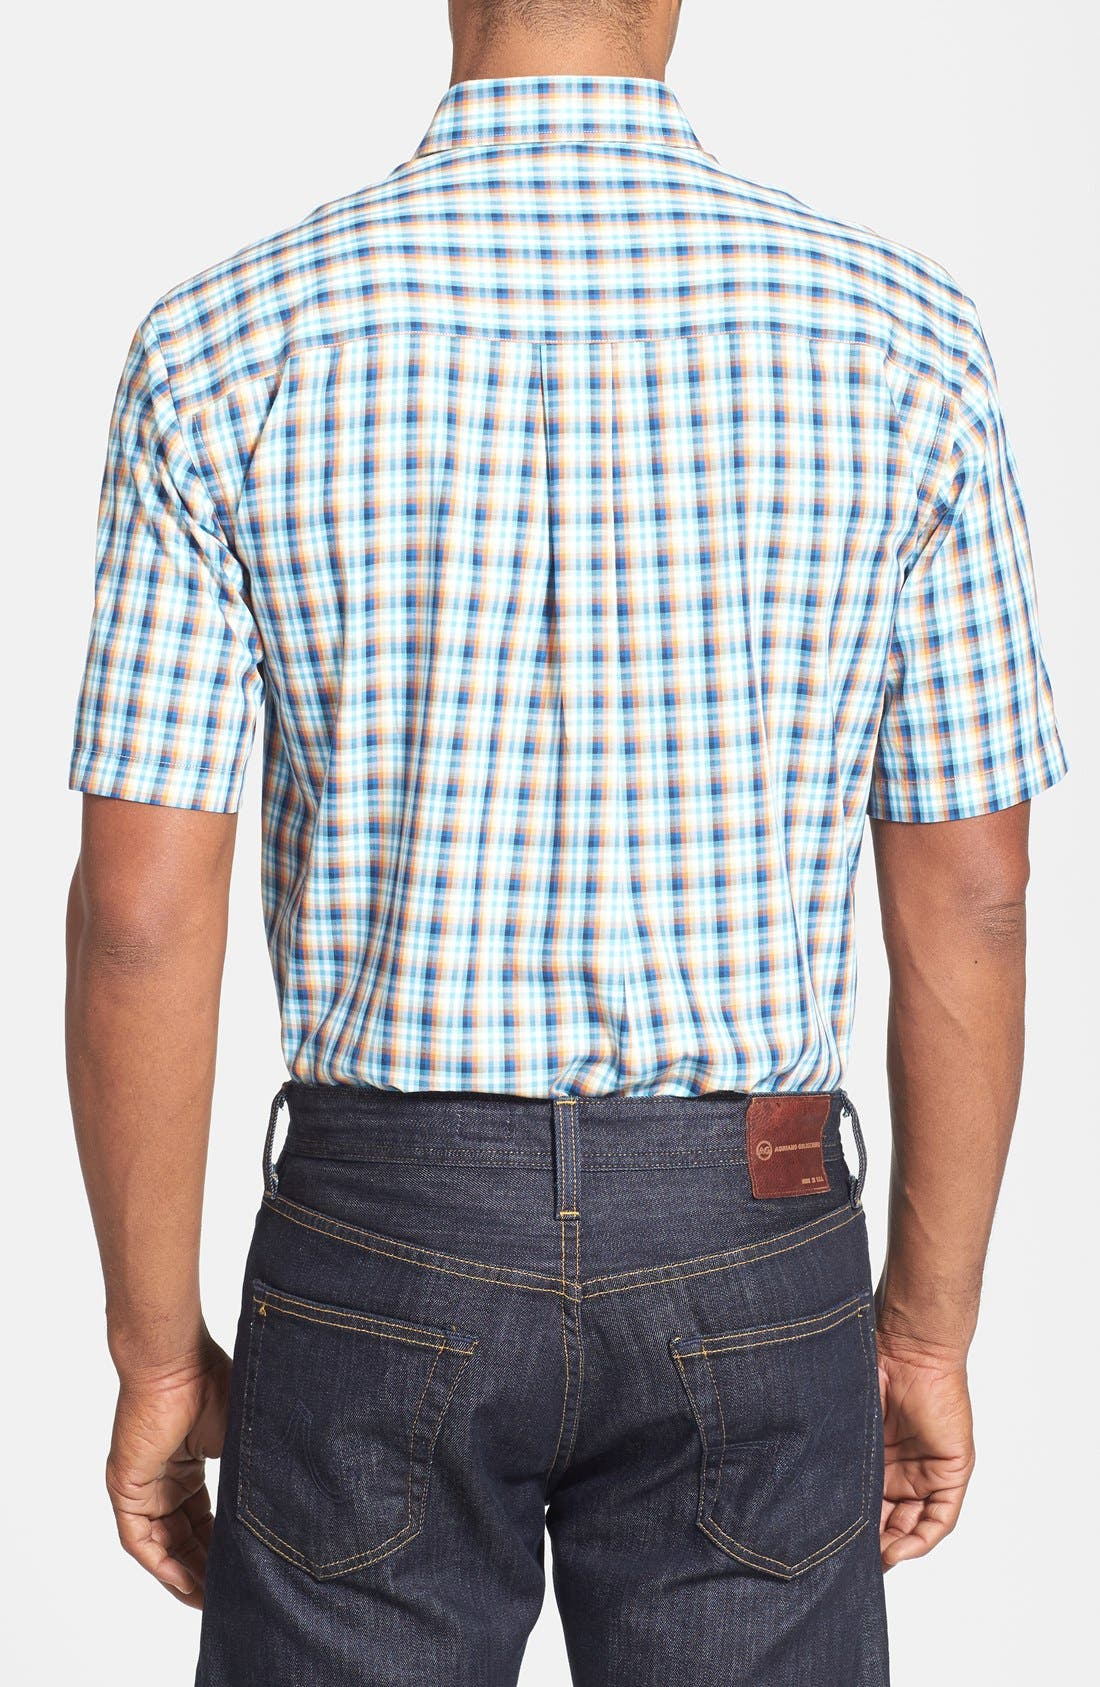 Alternate Image 2  - Cutter & Buck 'Morton Road' Classic Fit Short Sleeve Plaid Sport Shirt (Big & Tall)